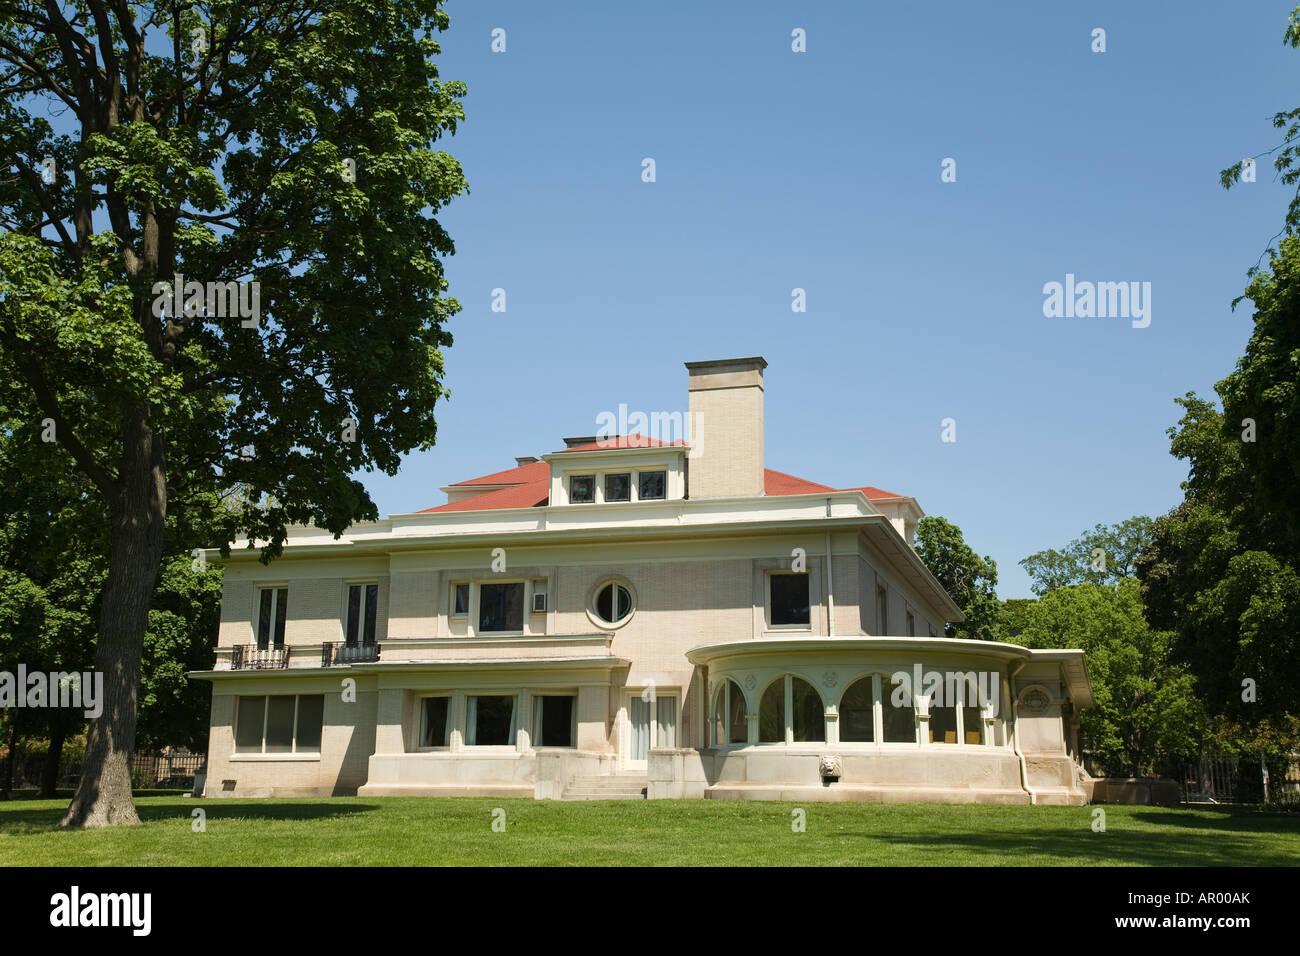 ILLINOIS Oak Park Pleasant Home John Farson House Prairie School Architecture George Maher Architect National Historic Landmark